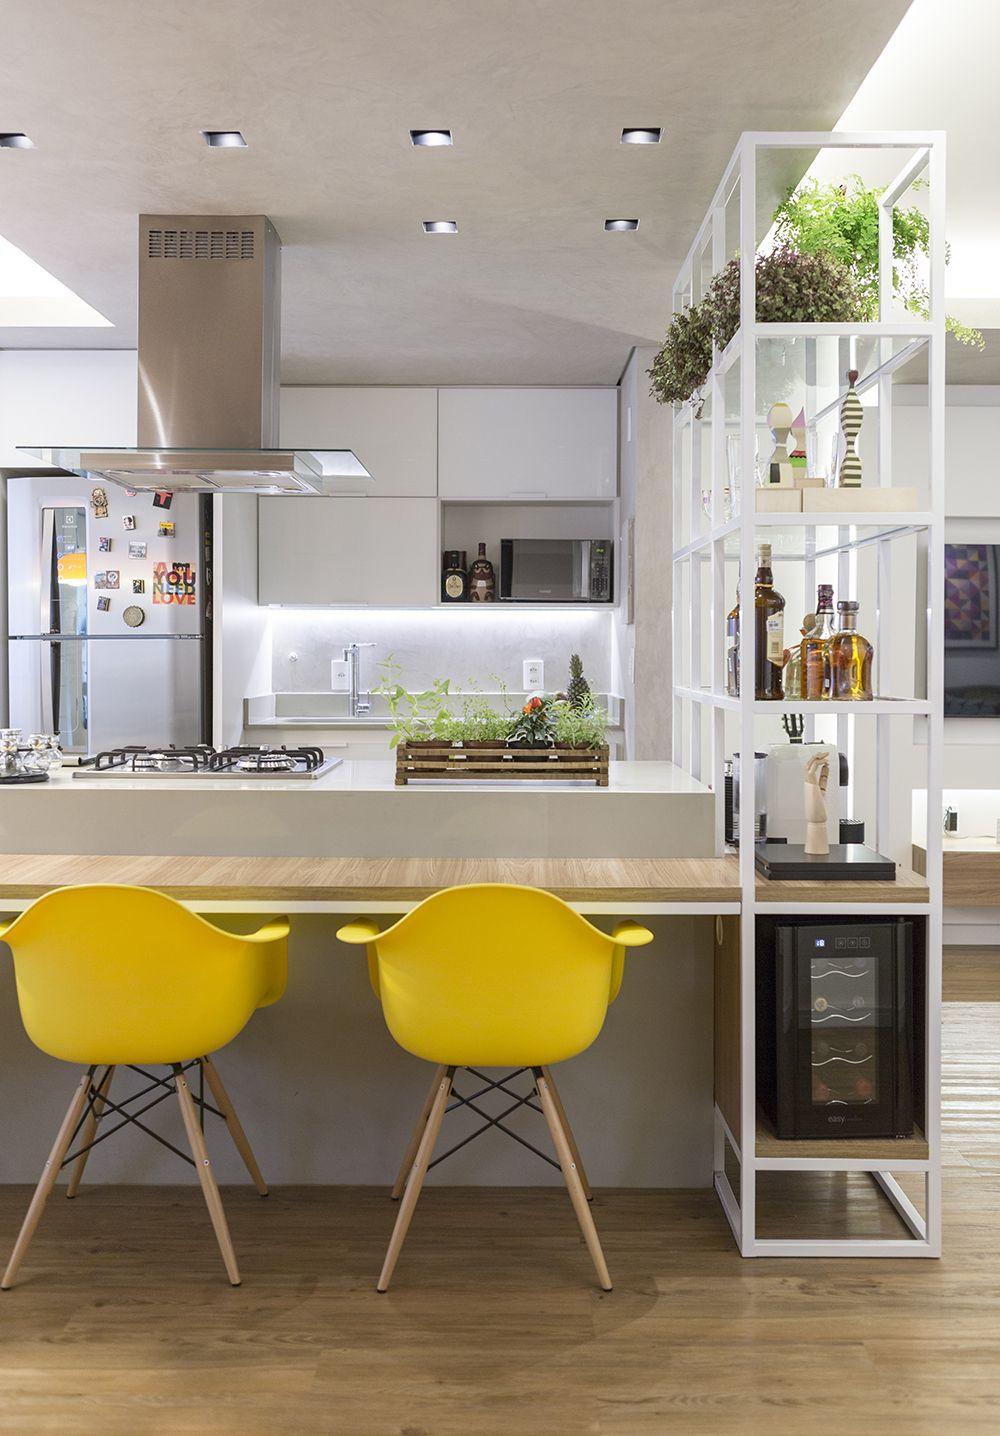 Cozinha   Design de Interiores   Pinterest   Küche